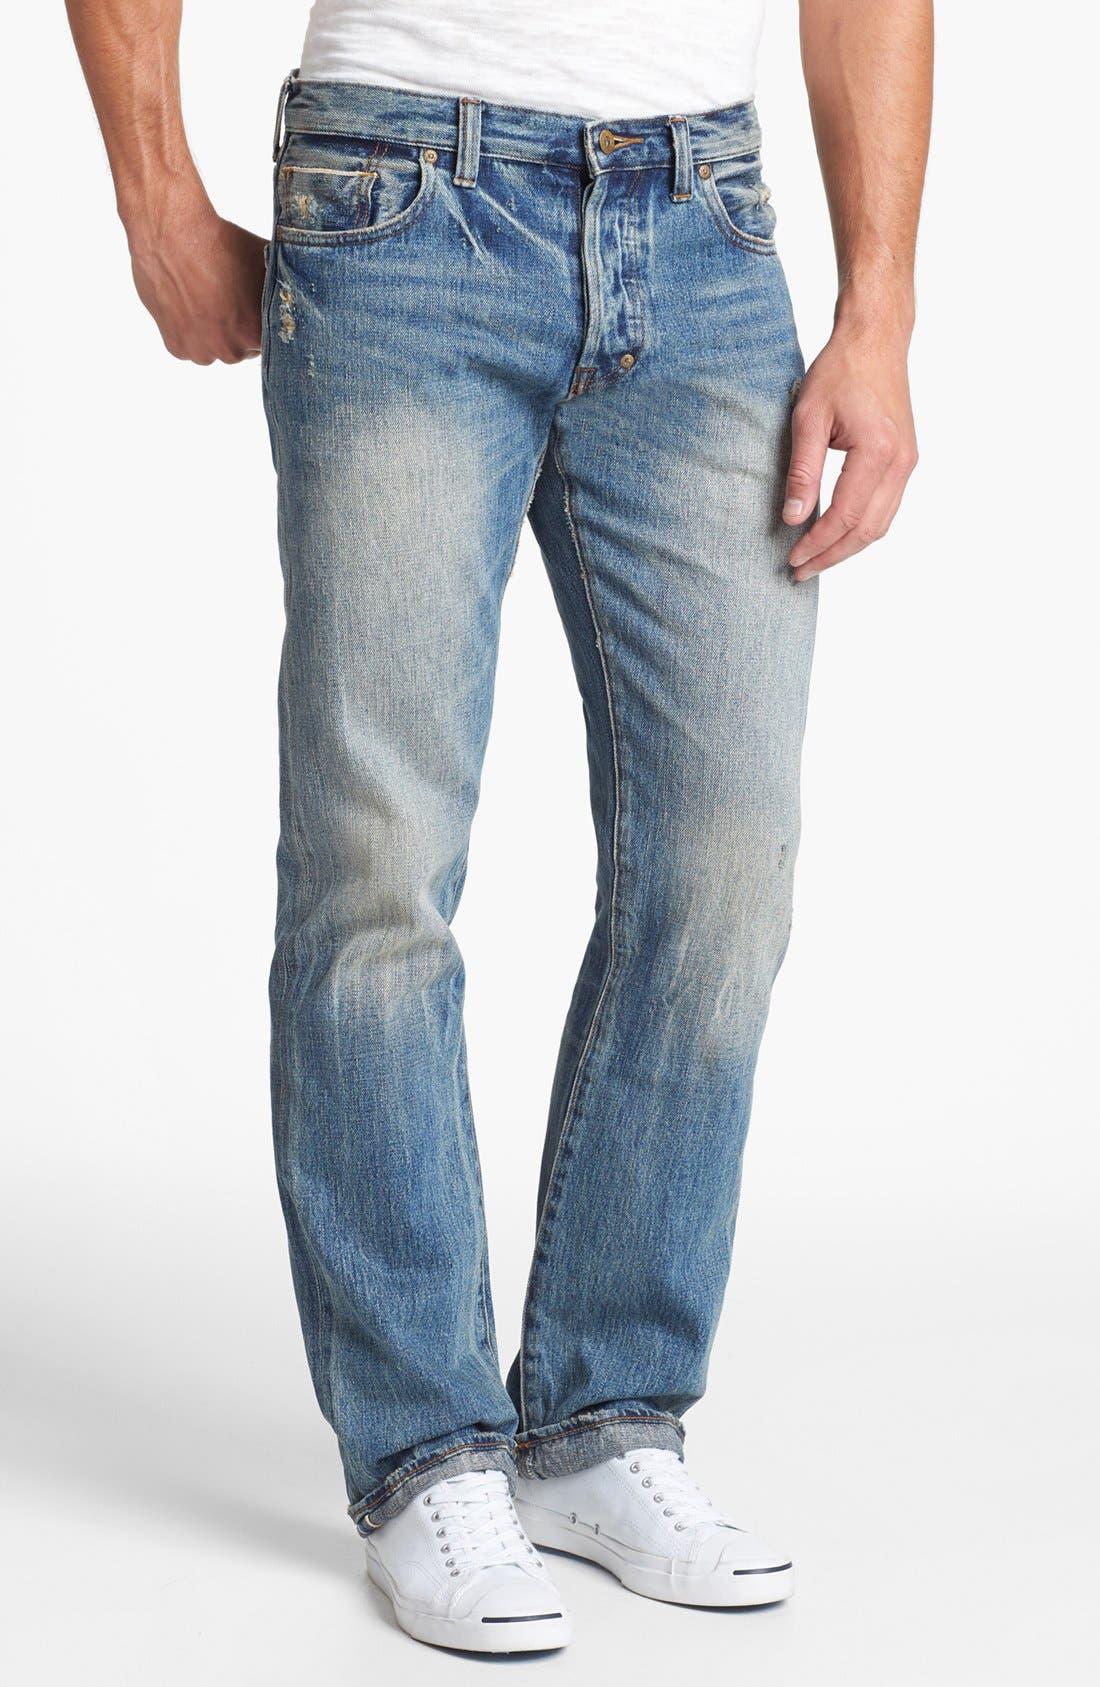 PRPS 'Barracuda' Straight Leg Selvedge Jeans